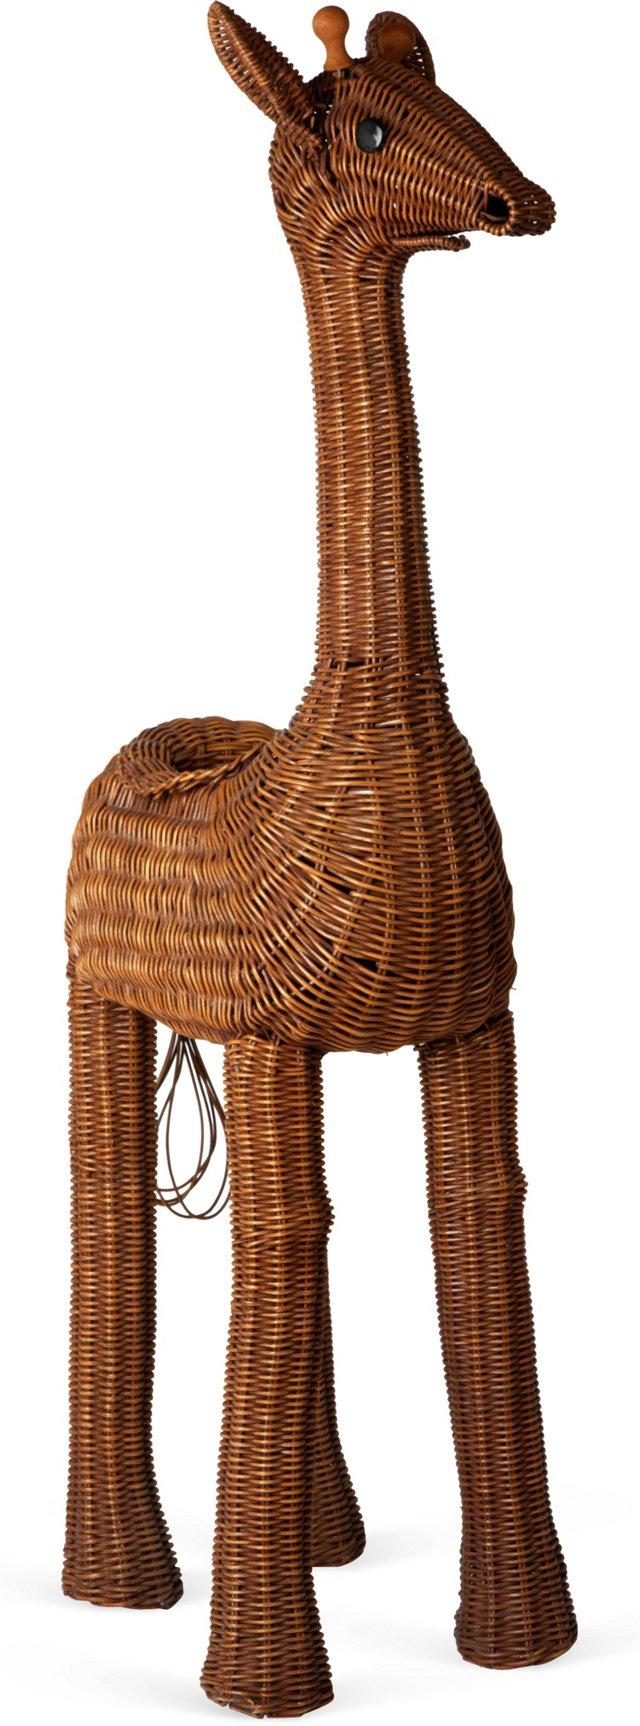 Playful & Fun Giraffe Planter